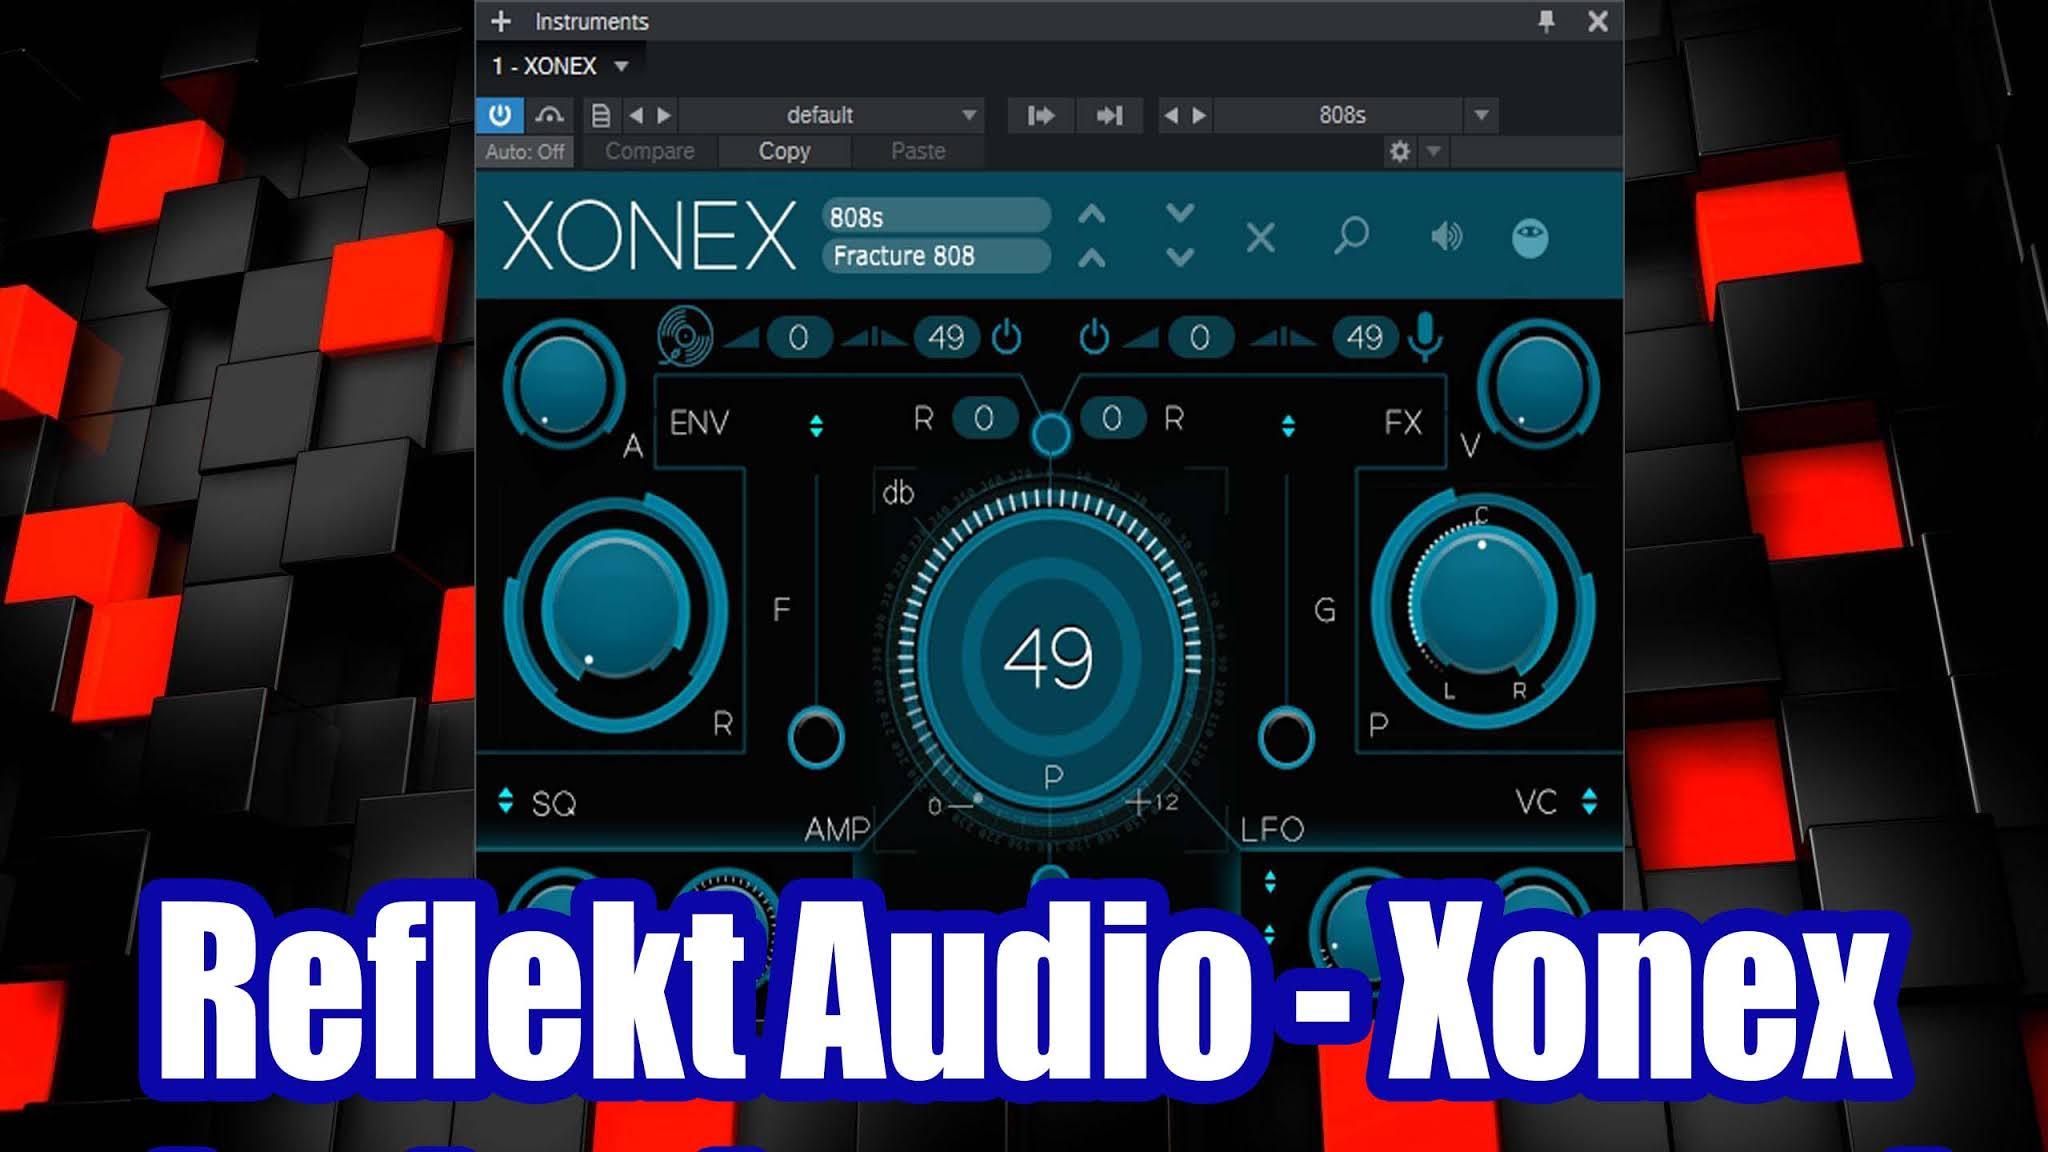 Reflekt Audio – Xonex